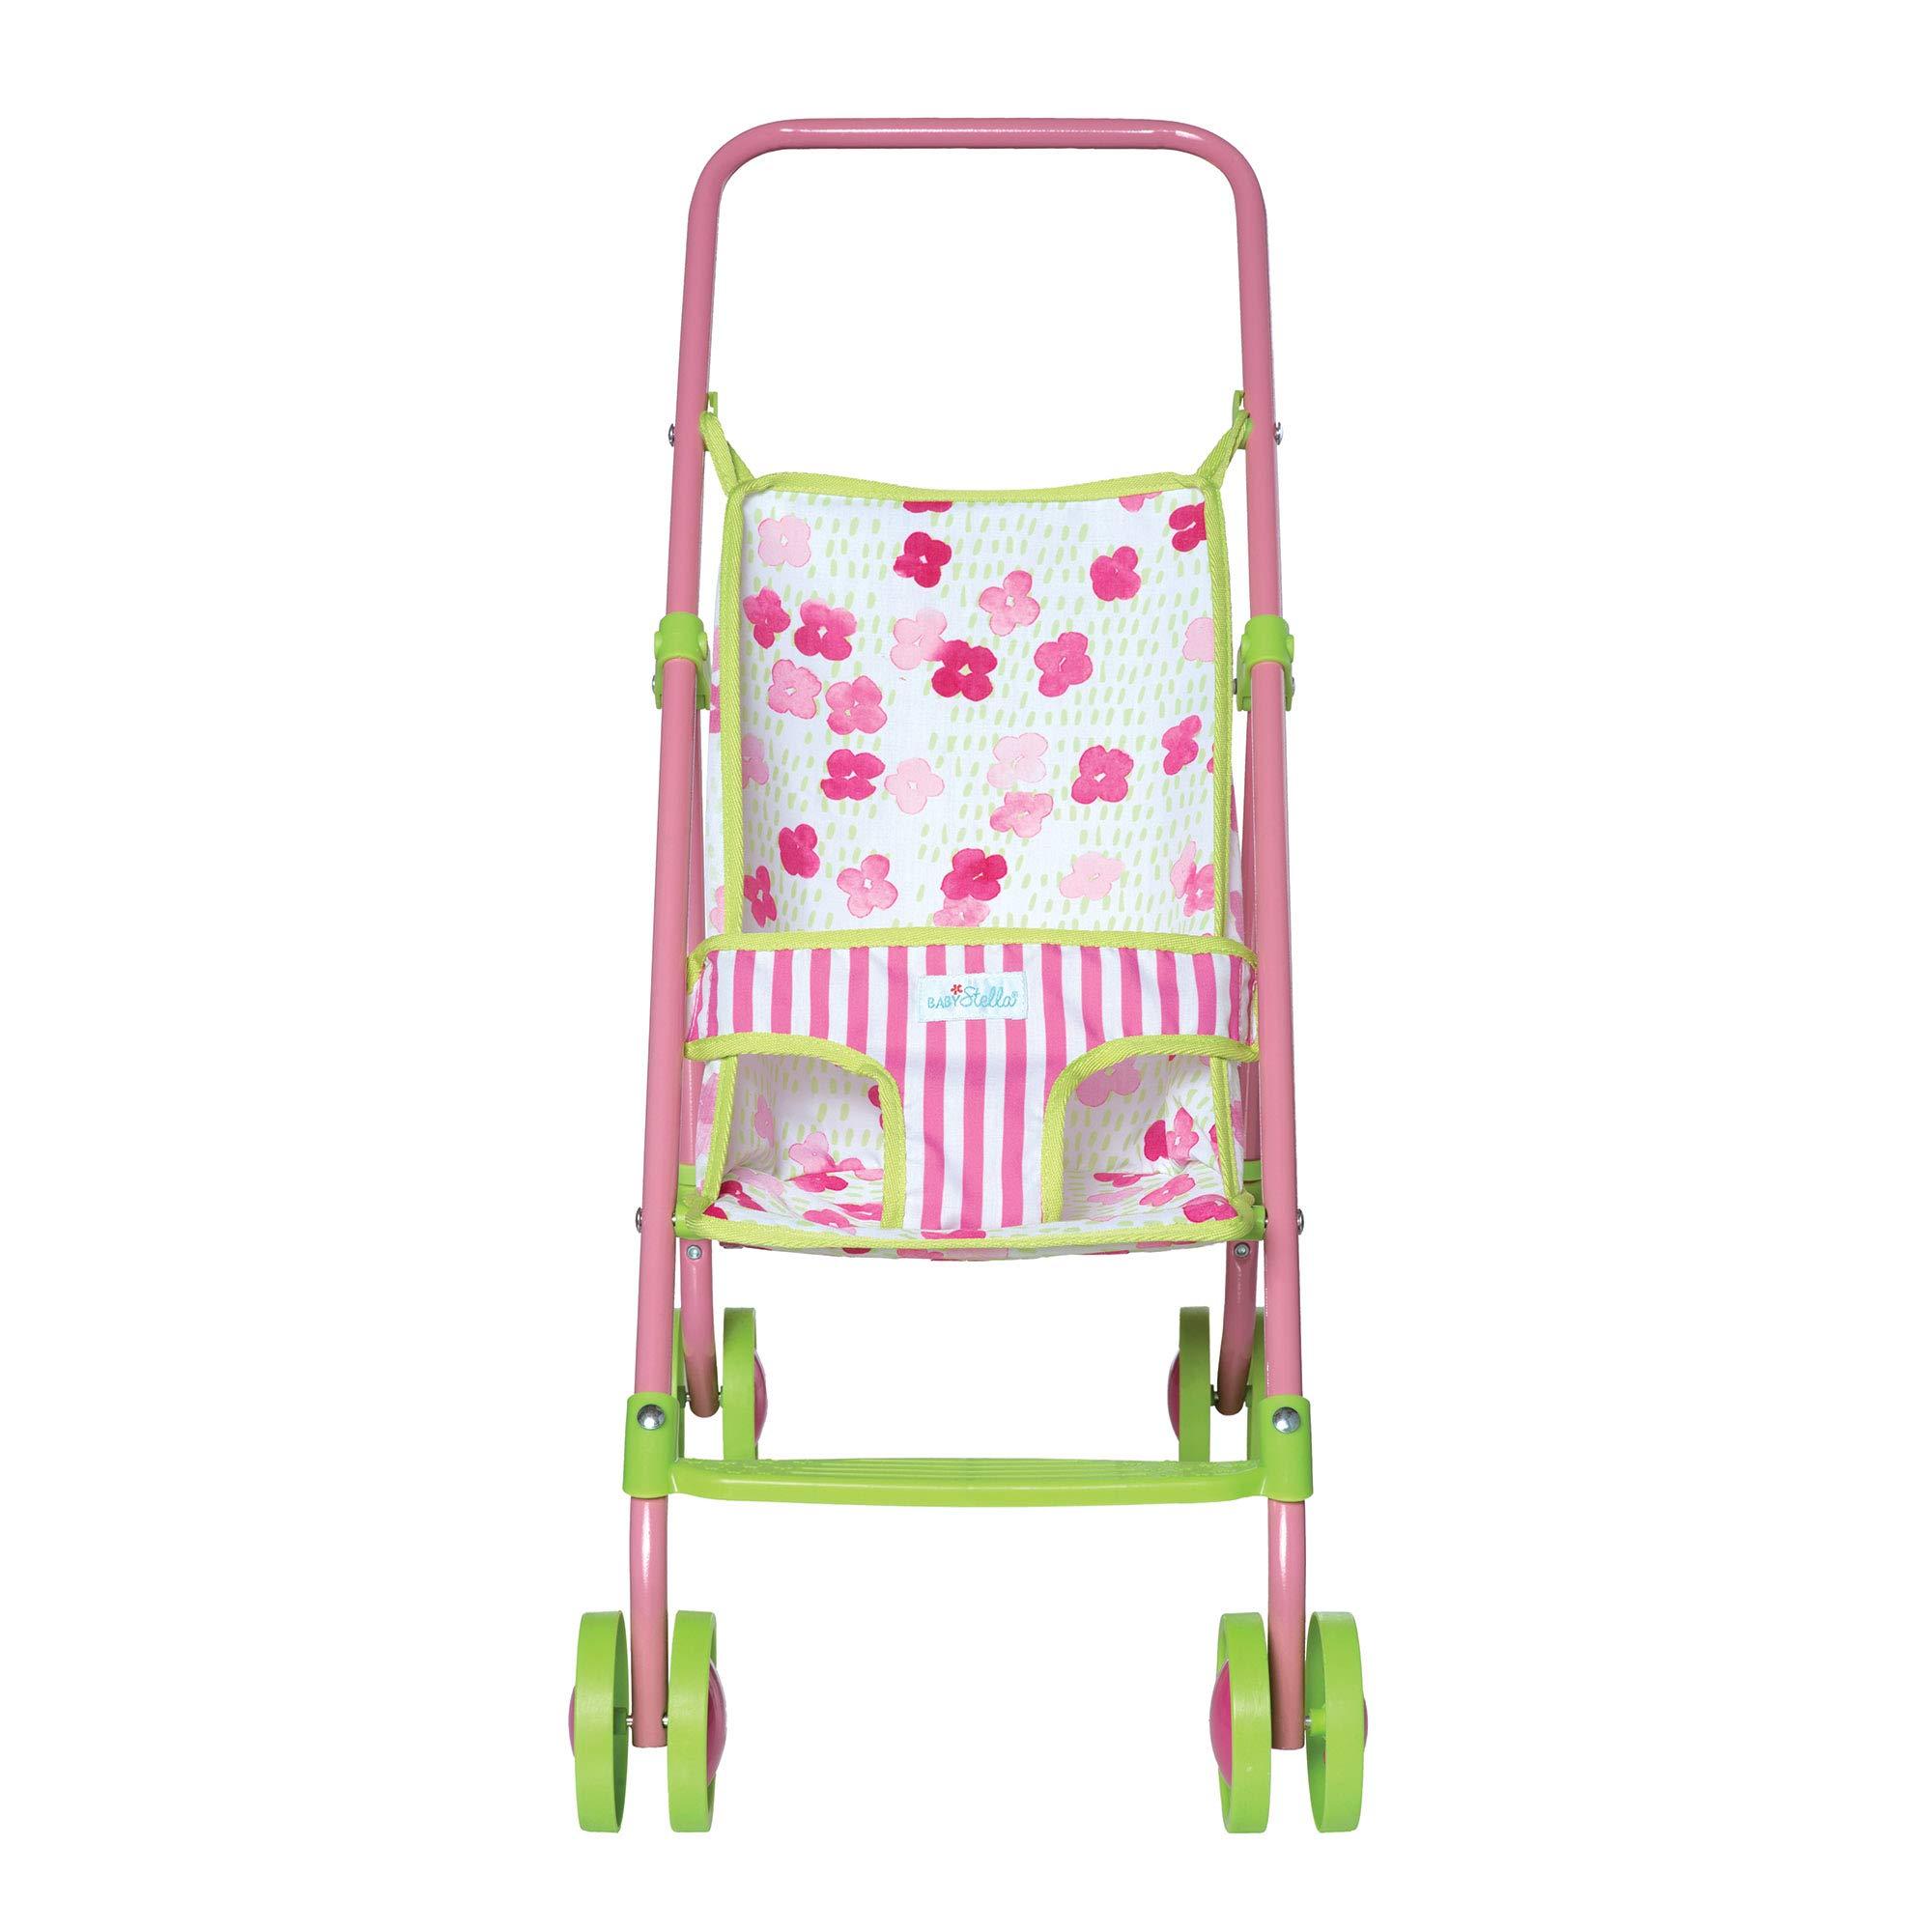 Manhattan Toy Baby Stella Baby Stroller Toy for 12'' and 15'' Soft Dolls by Manhattan Toy